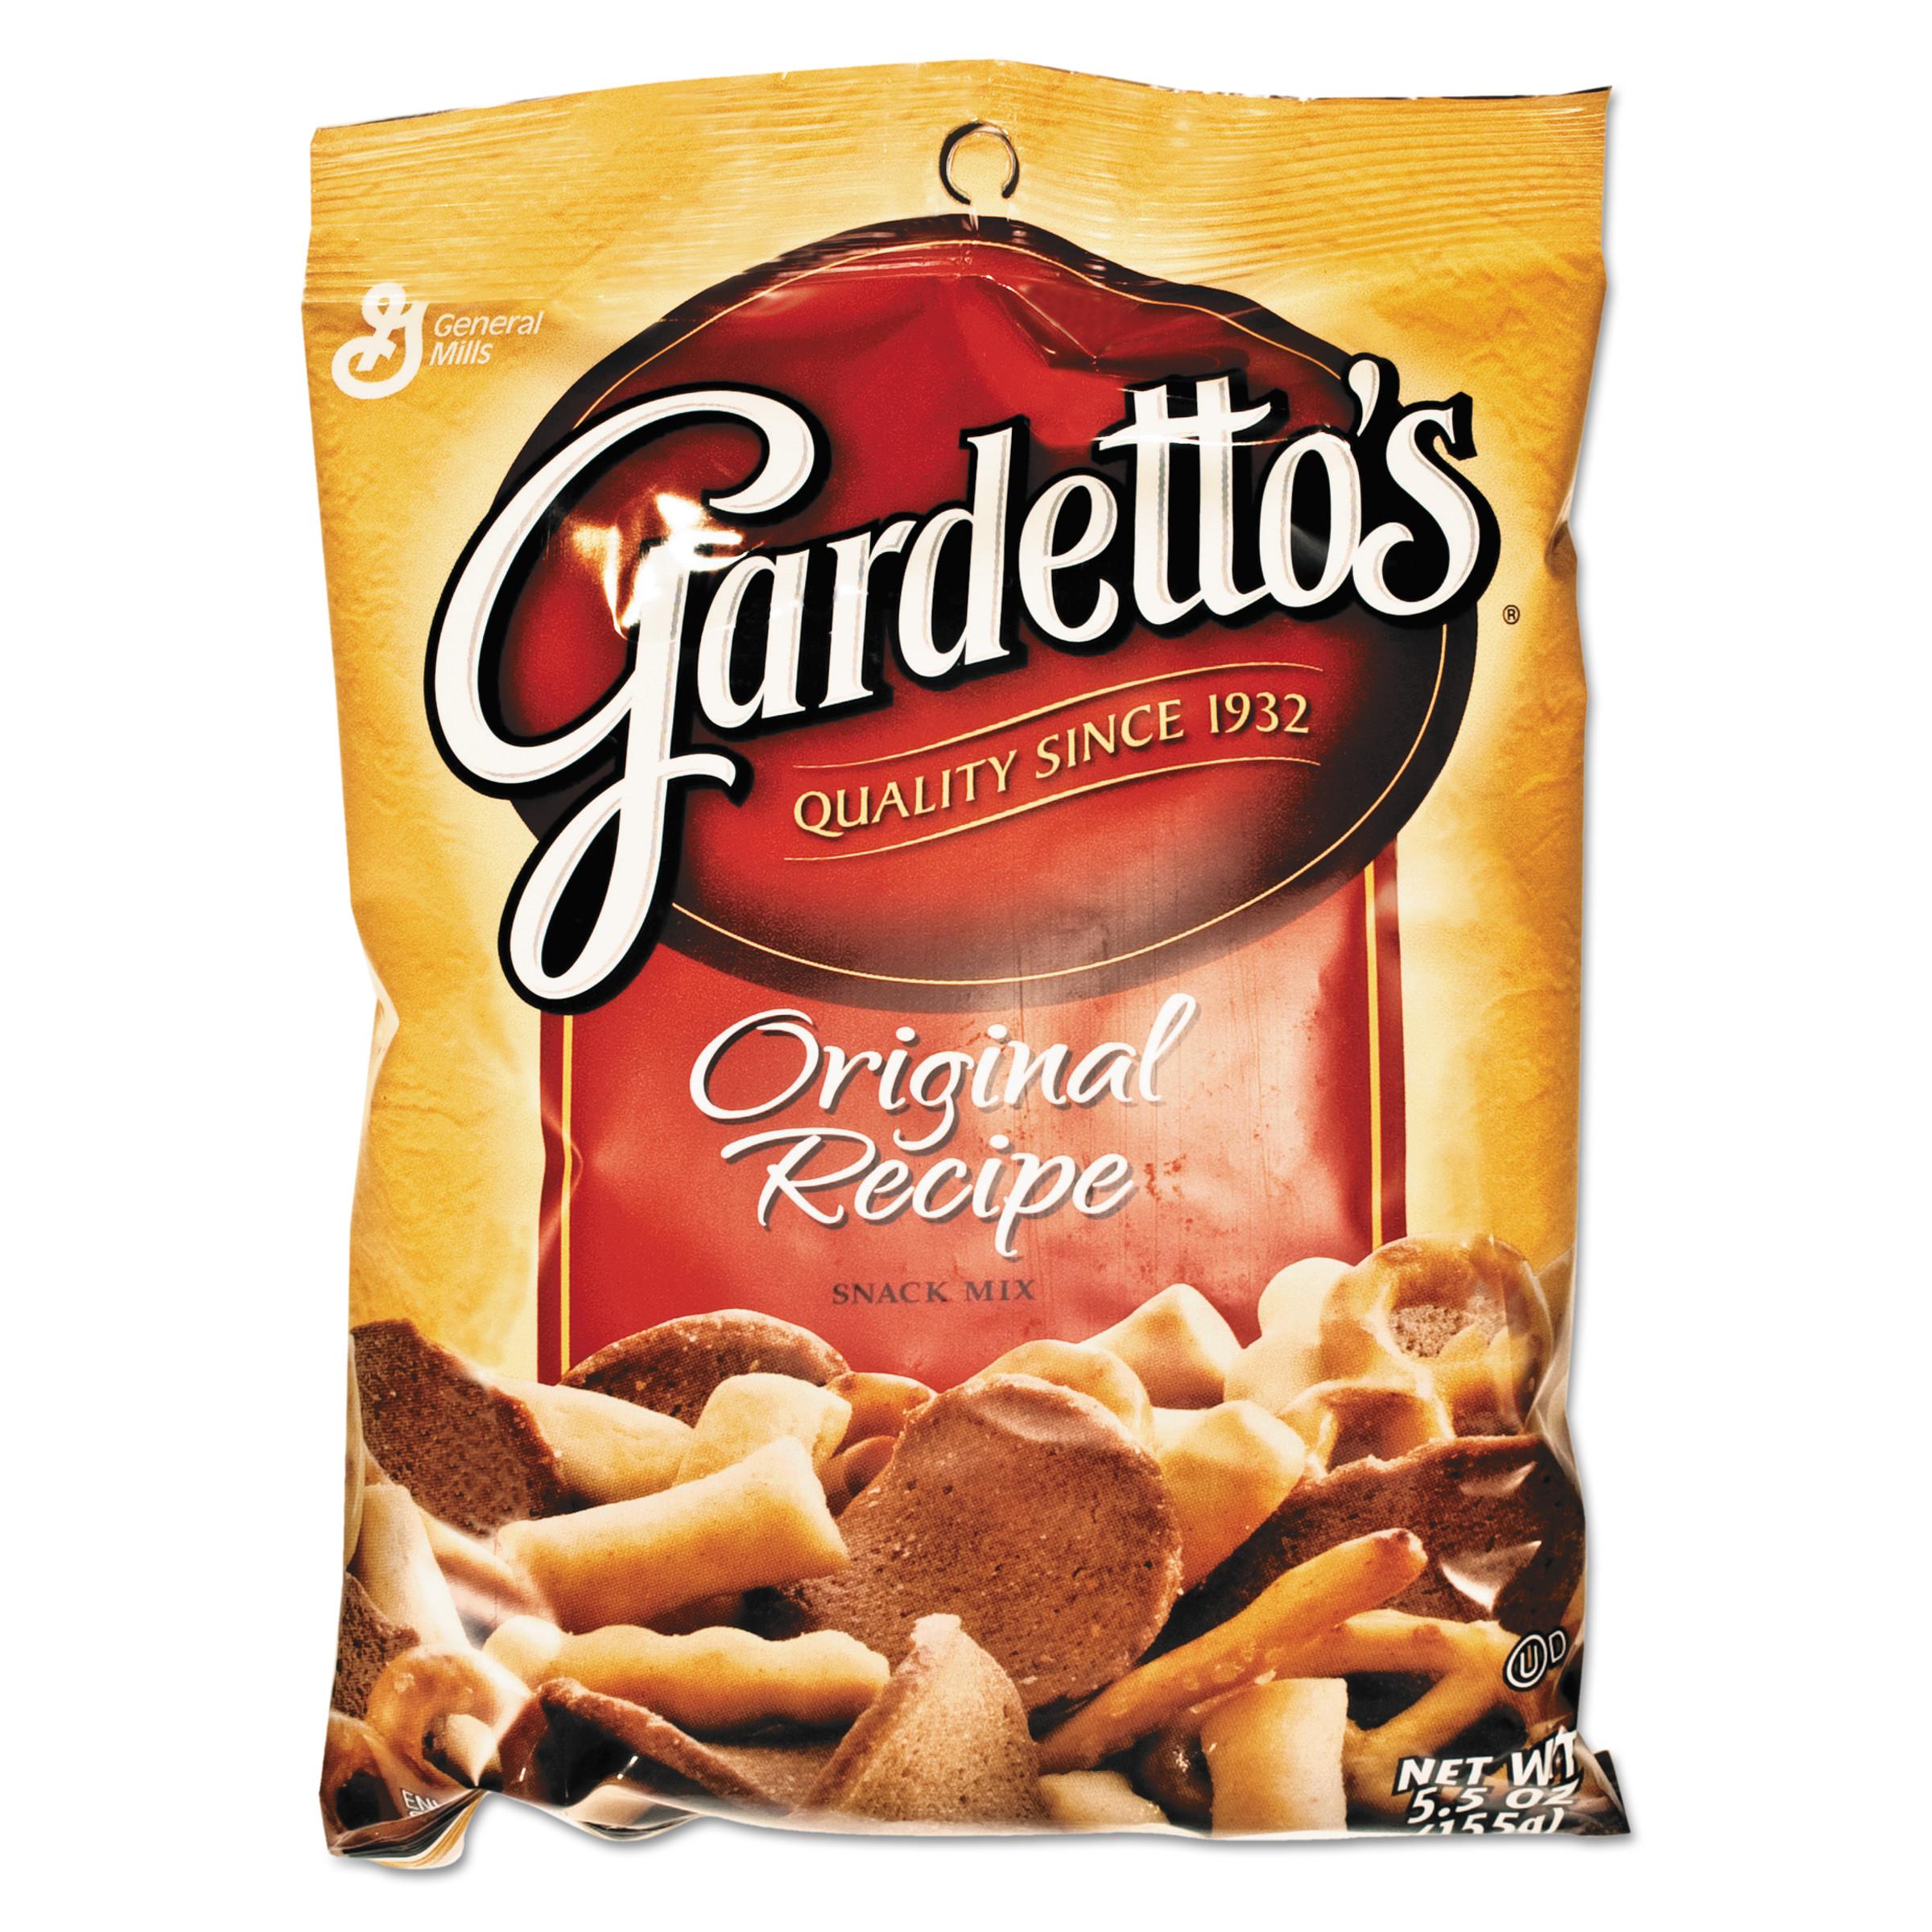 Image of General Mills Gardetto's Snack Mix, Original Flavor, 5.5oz Bag, 7/Box